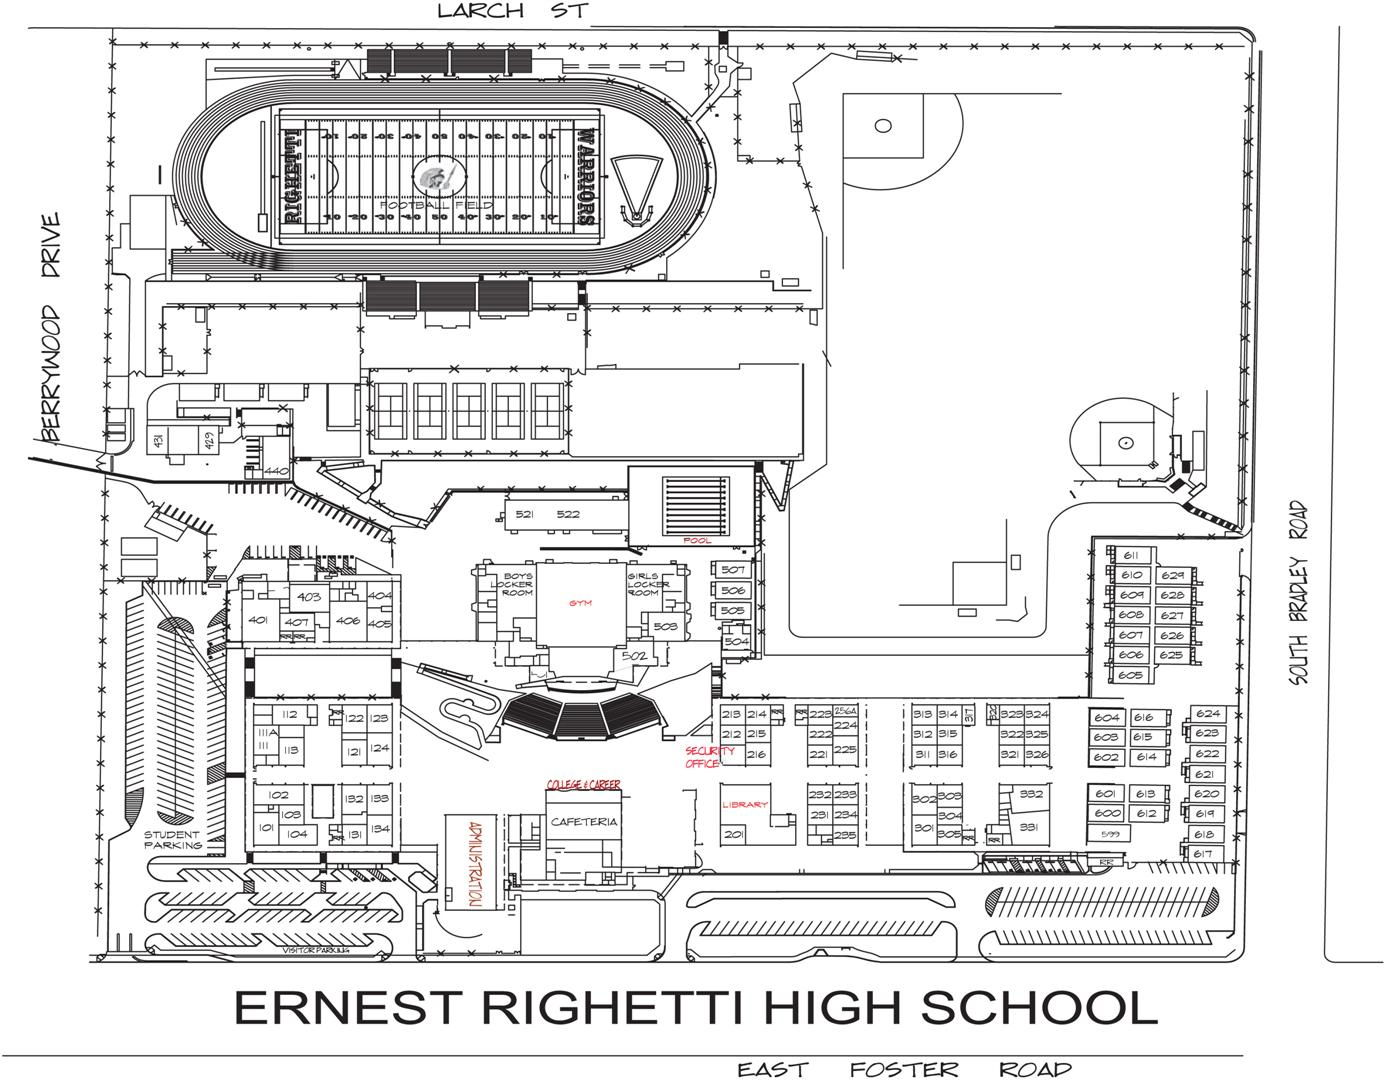 Ernest Righetti High School: Directions